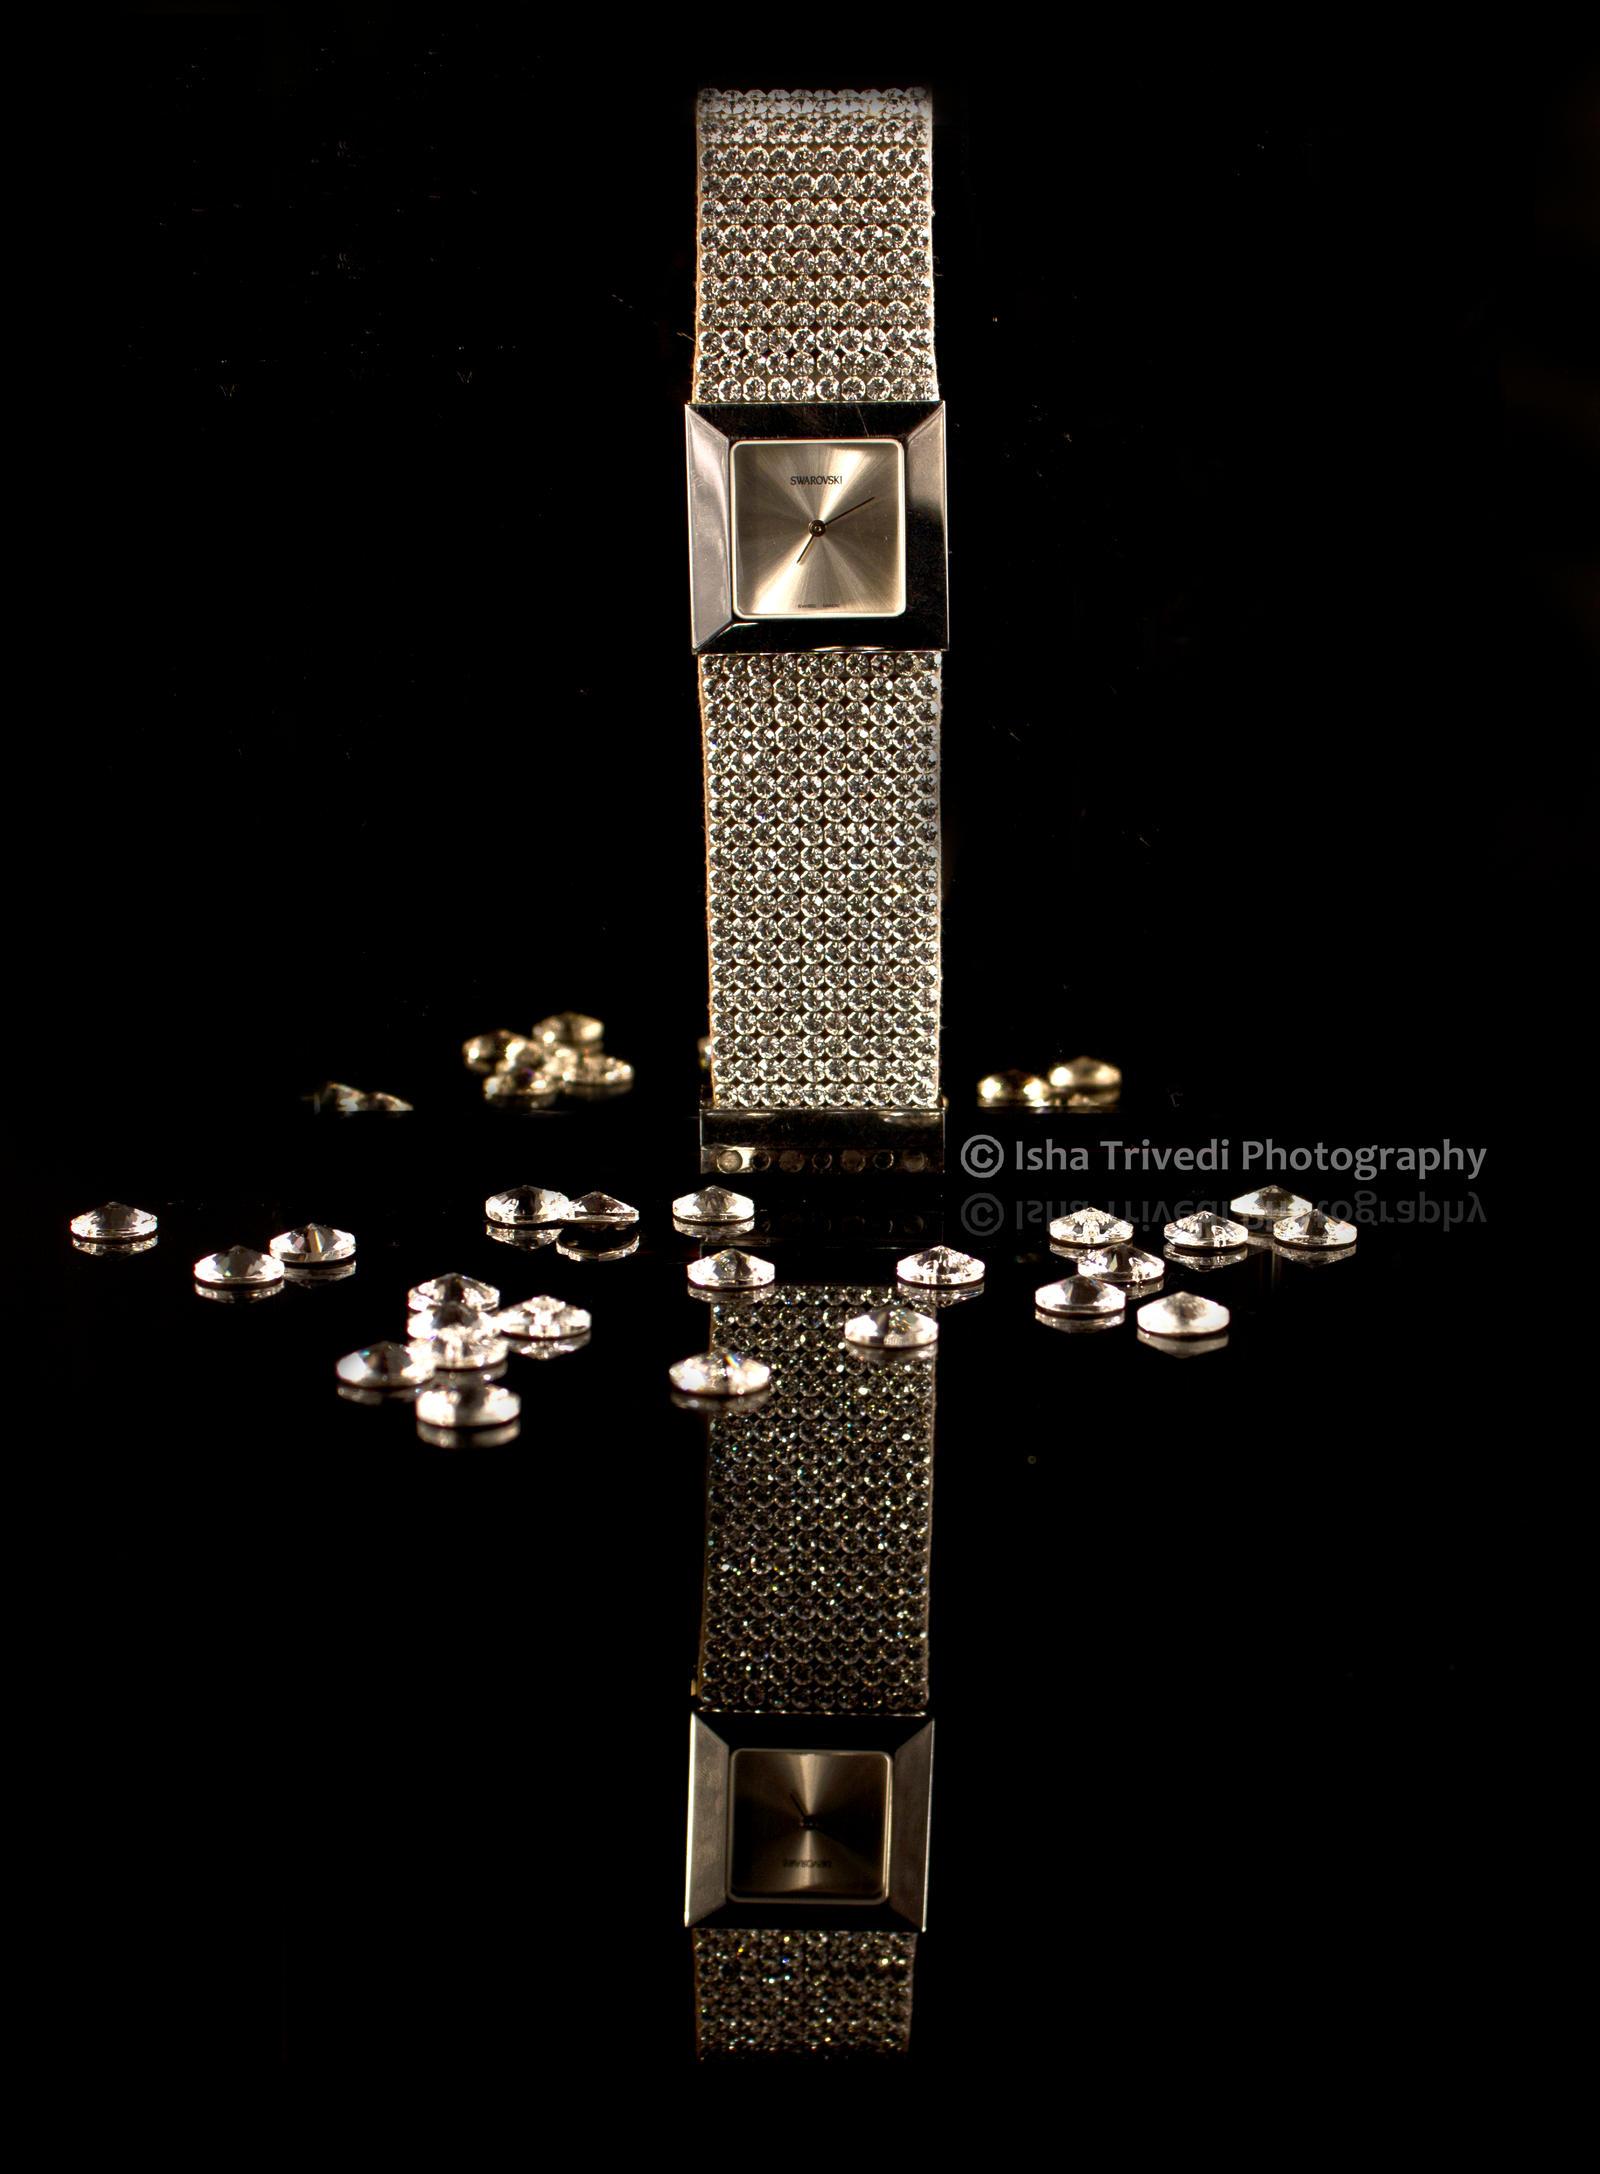 Swarovski Watch - Isha Trivedi Photography by trivediisha